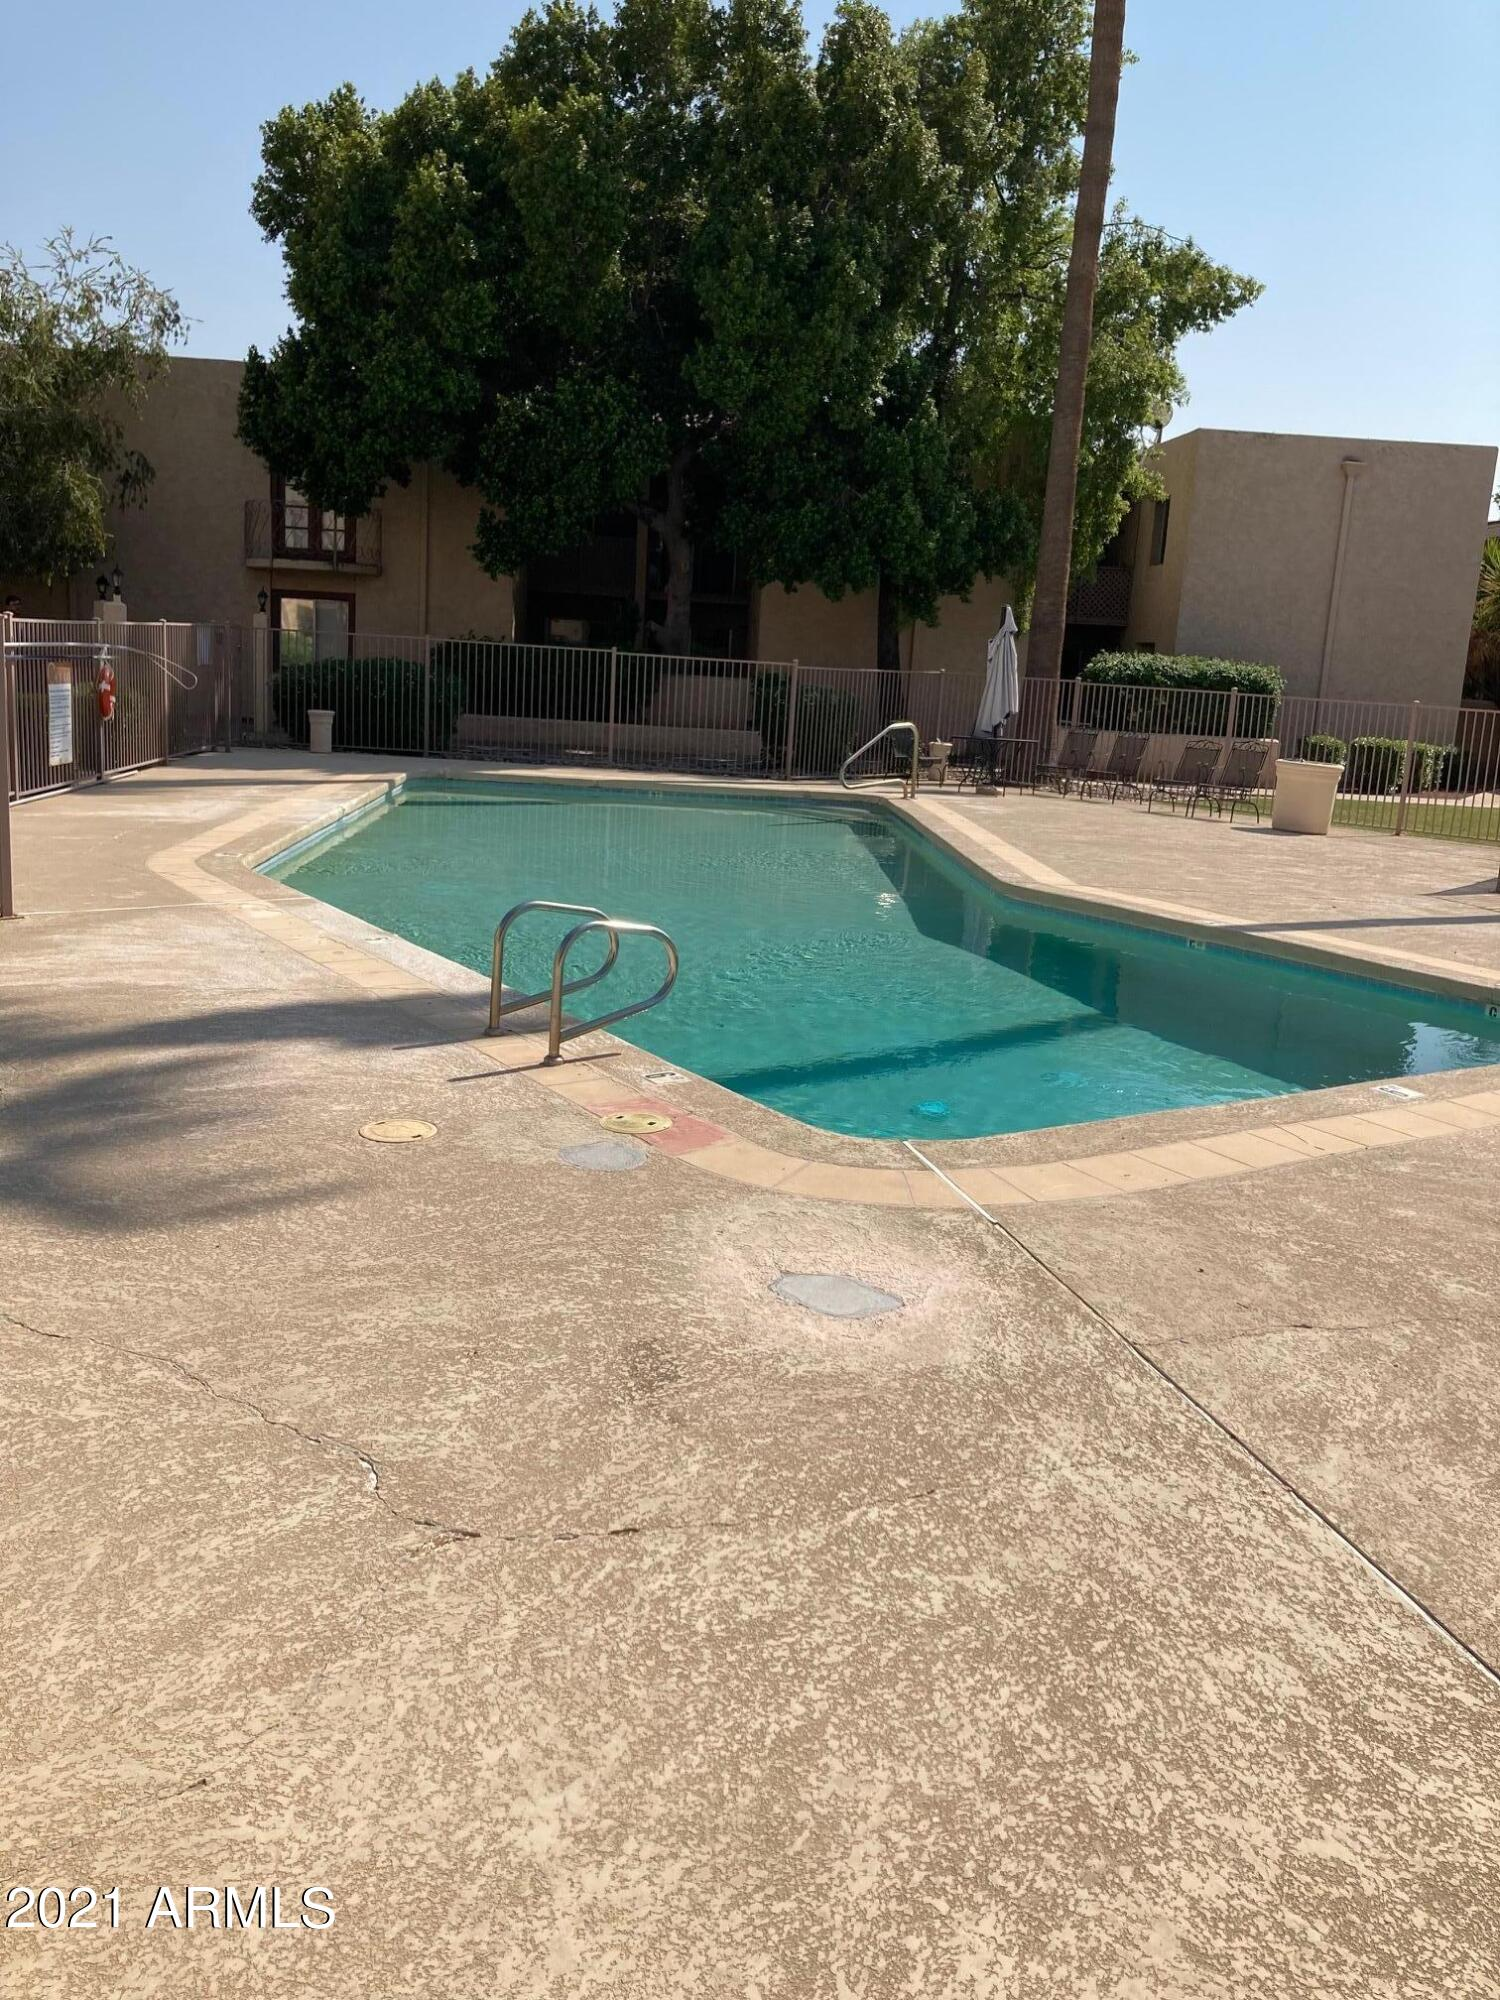 MLS 6293503 3313 N 68TH Street Unit 243, Scottsdale, AZ 85251 Scottsdale AZ Old Town Scottsdale